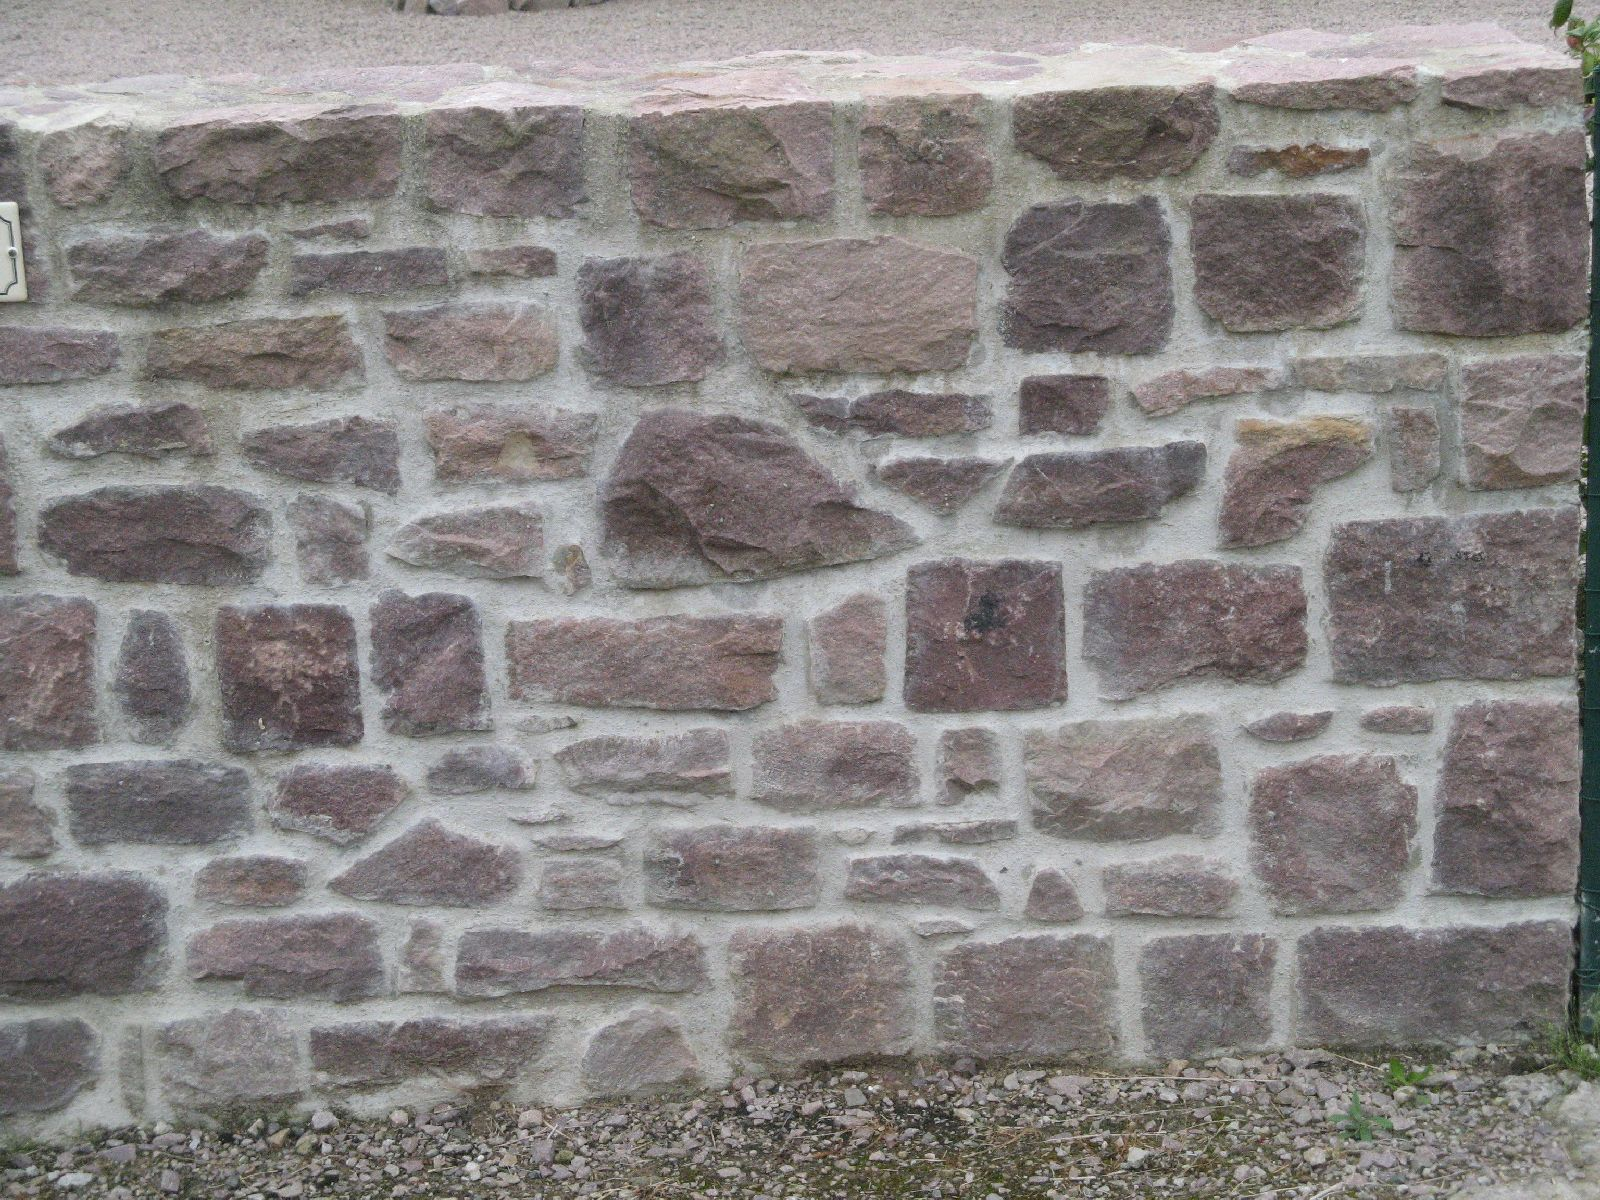 Brick_Texture_B_2431